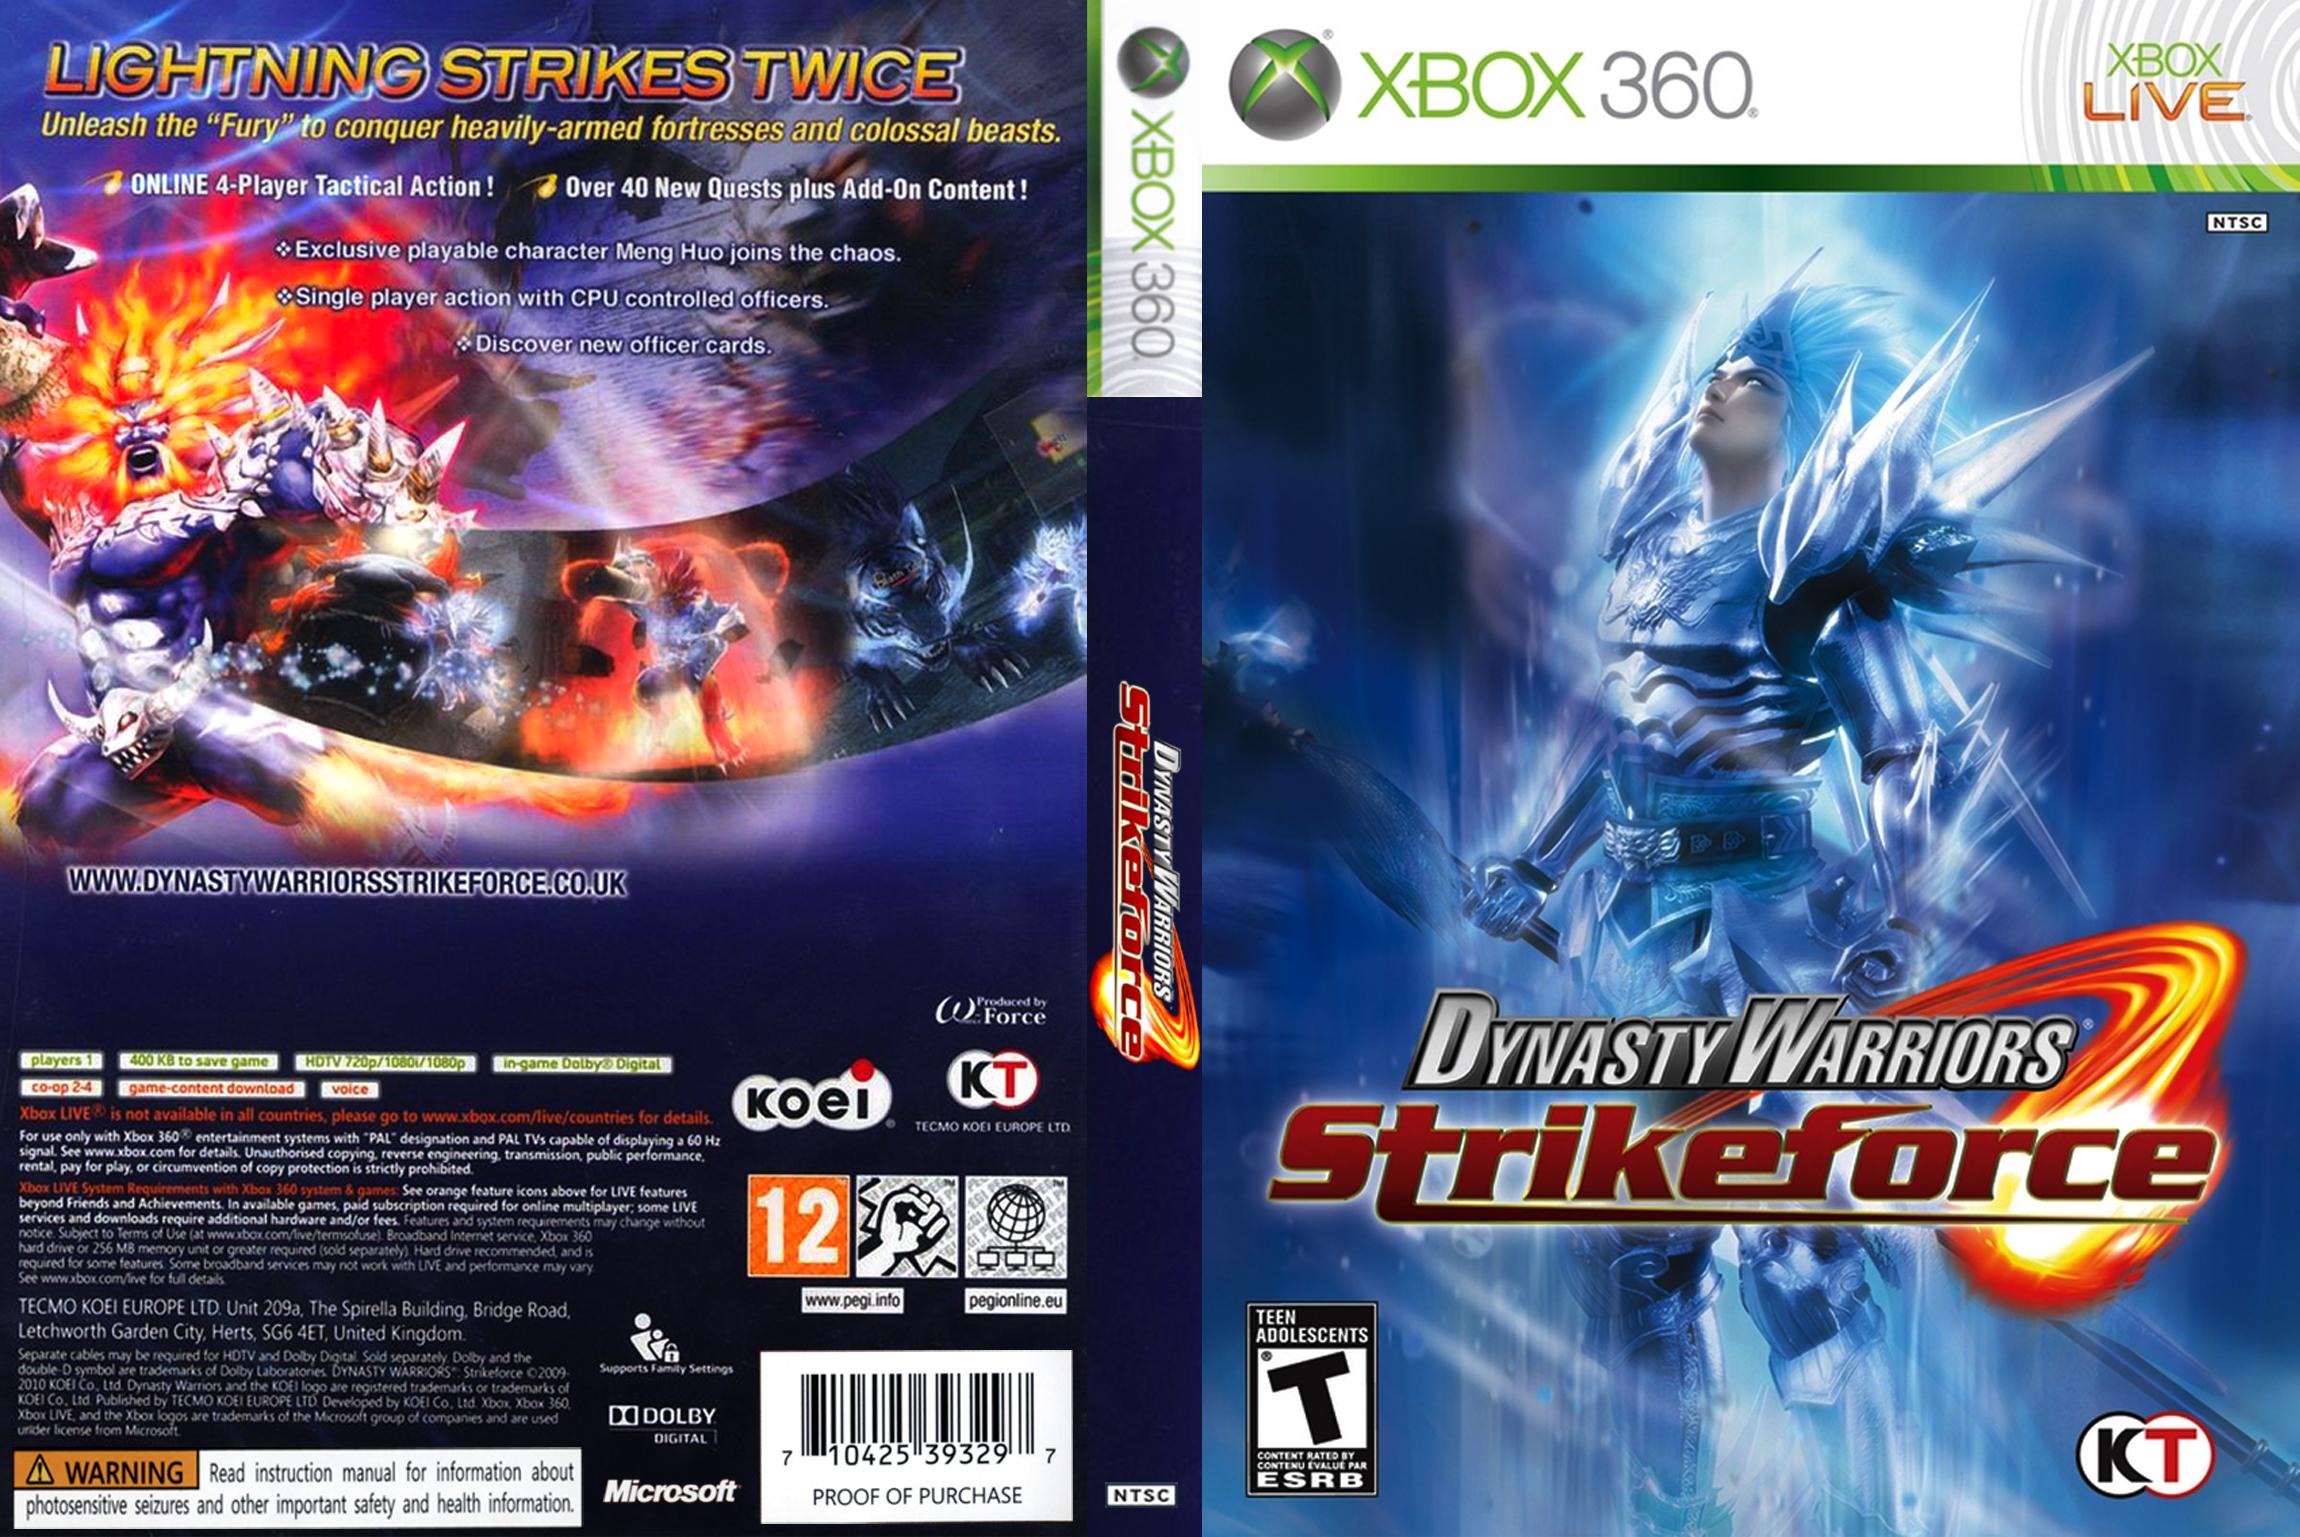 DynastyWarriorsStrikeforce